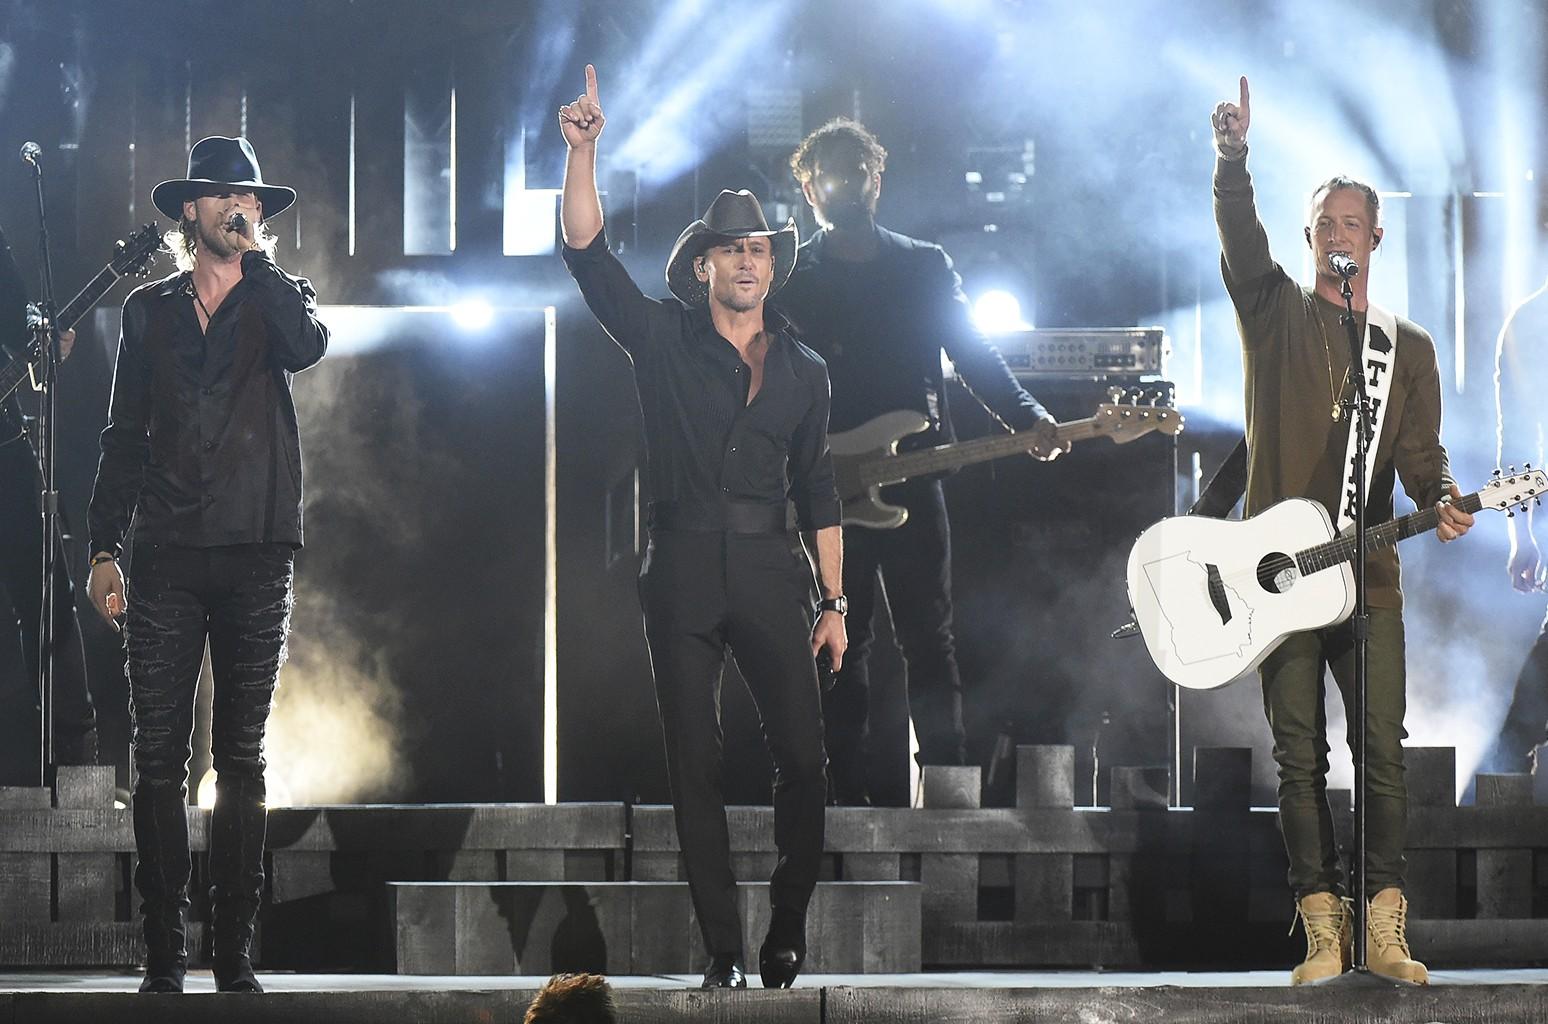 Tim McGraw and Florida Georgia Line perform at the 50th annual CMA Awards